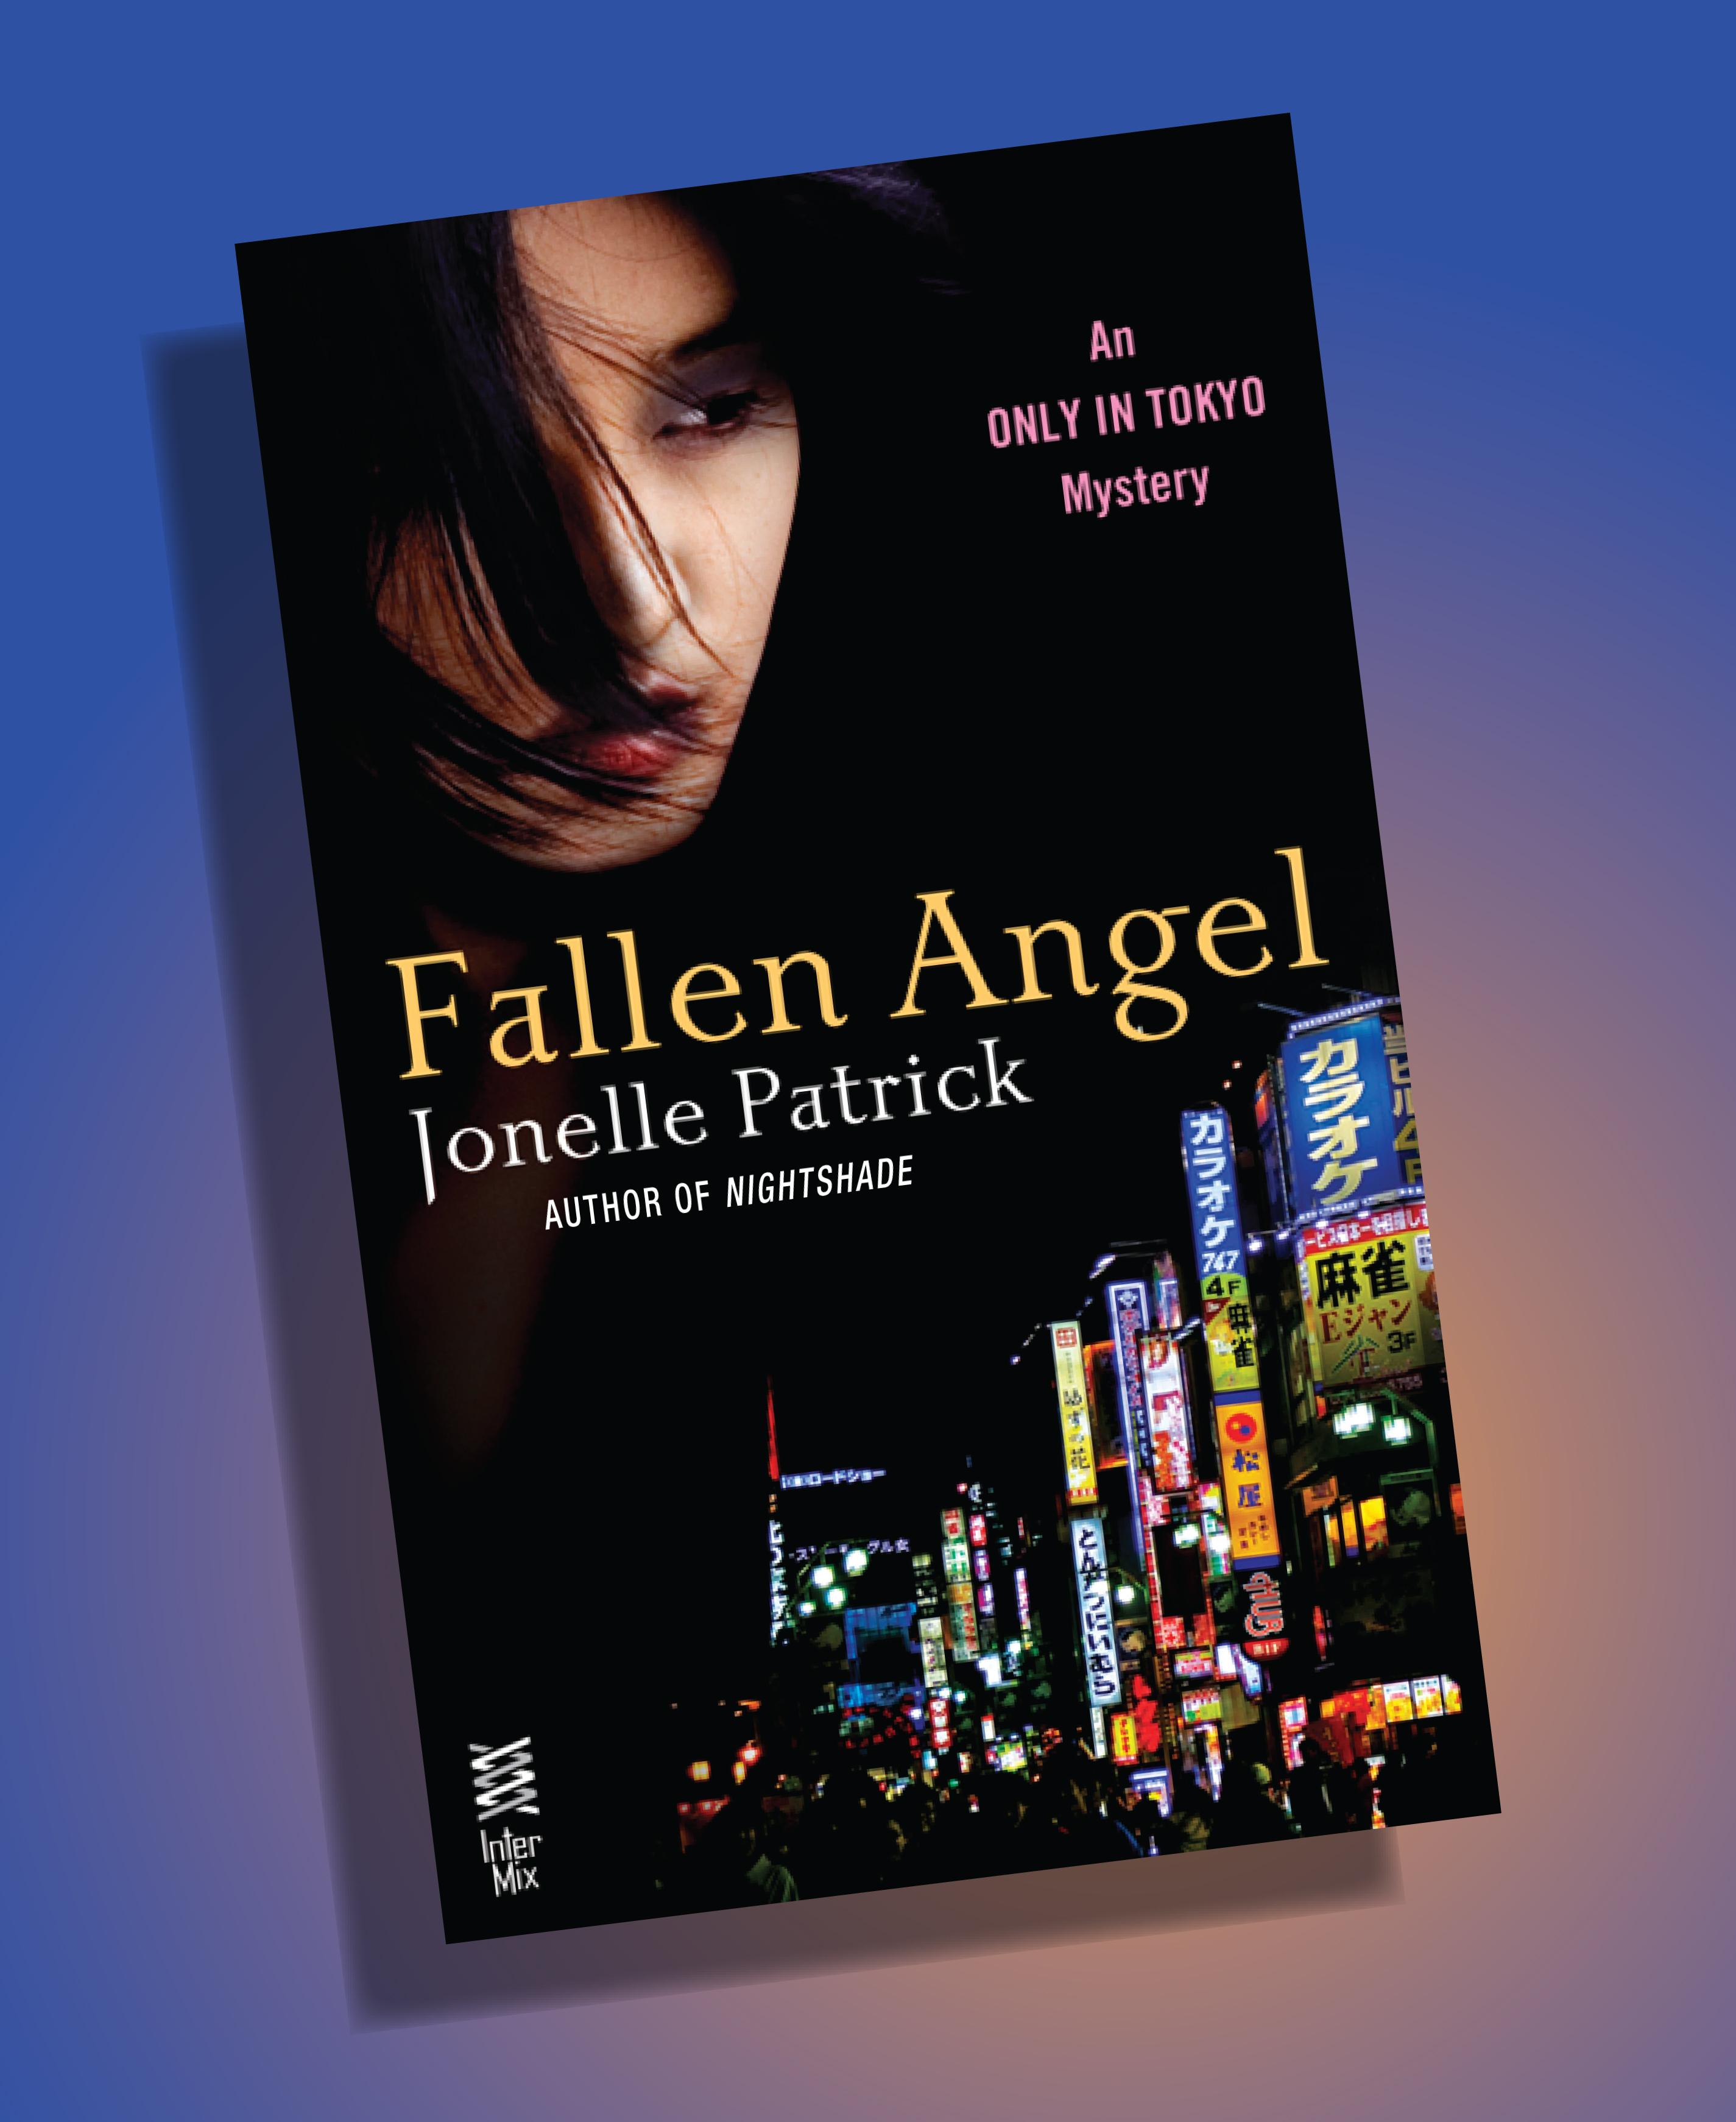 Japanese Word For Fallen Angel - Hot Girls Wallpaper